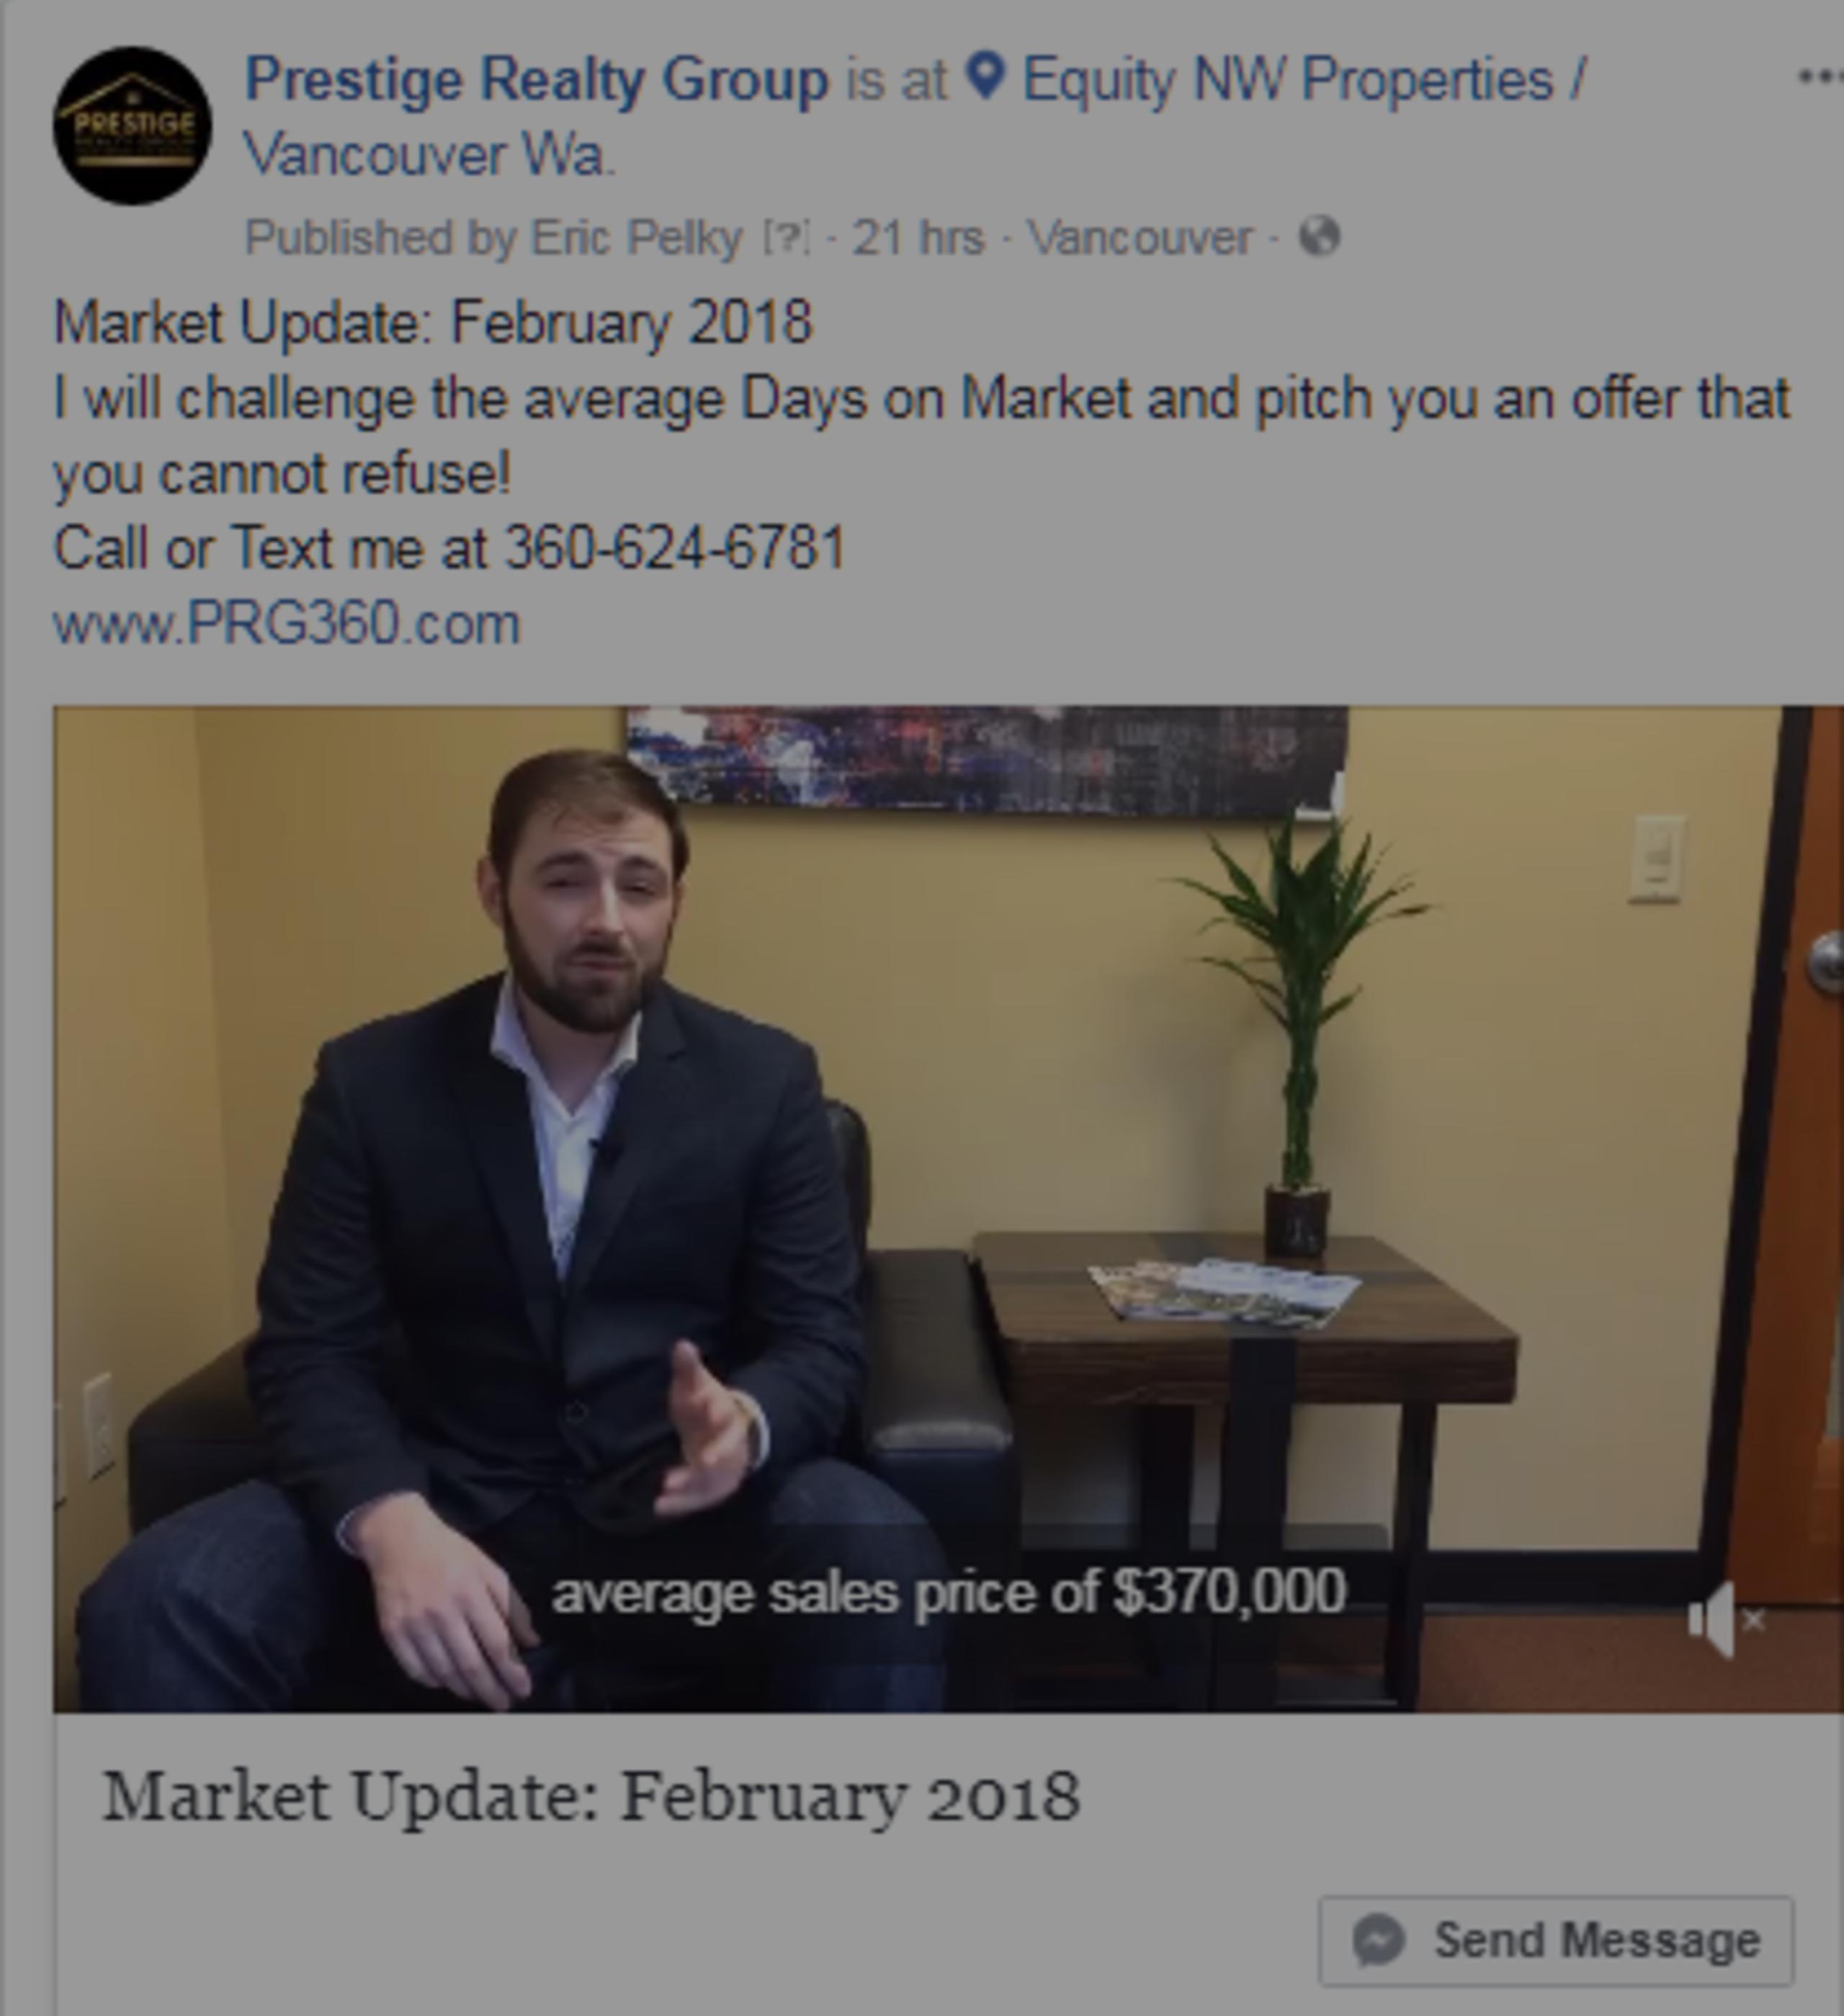 Market Update – February 2018